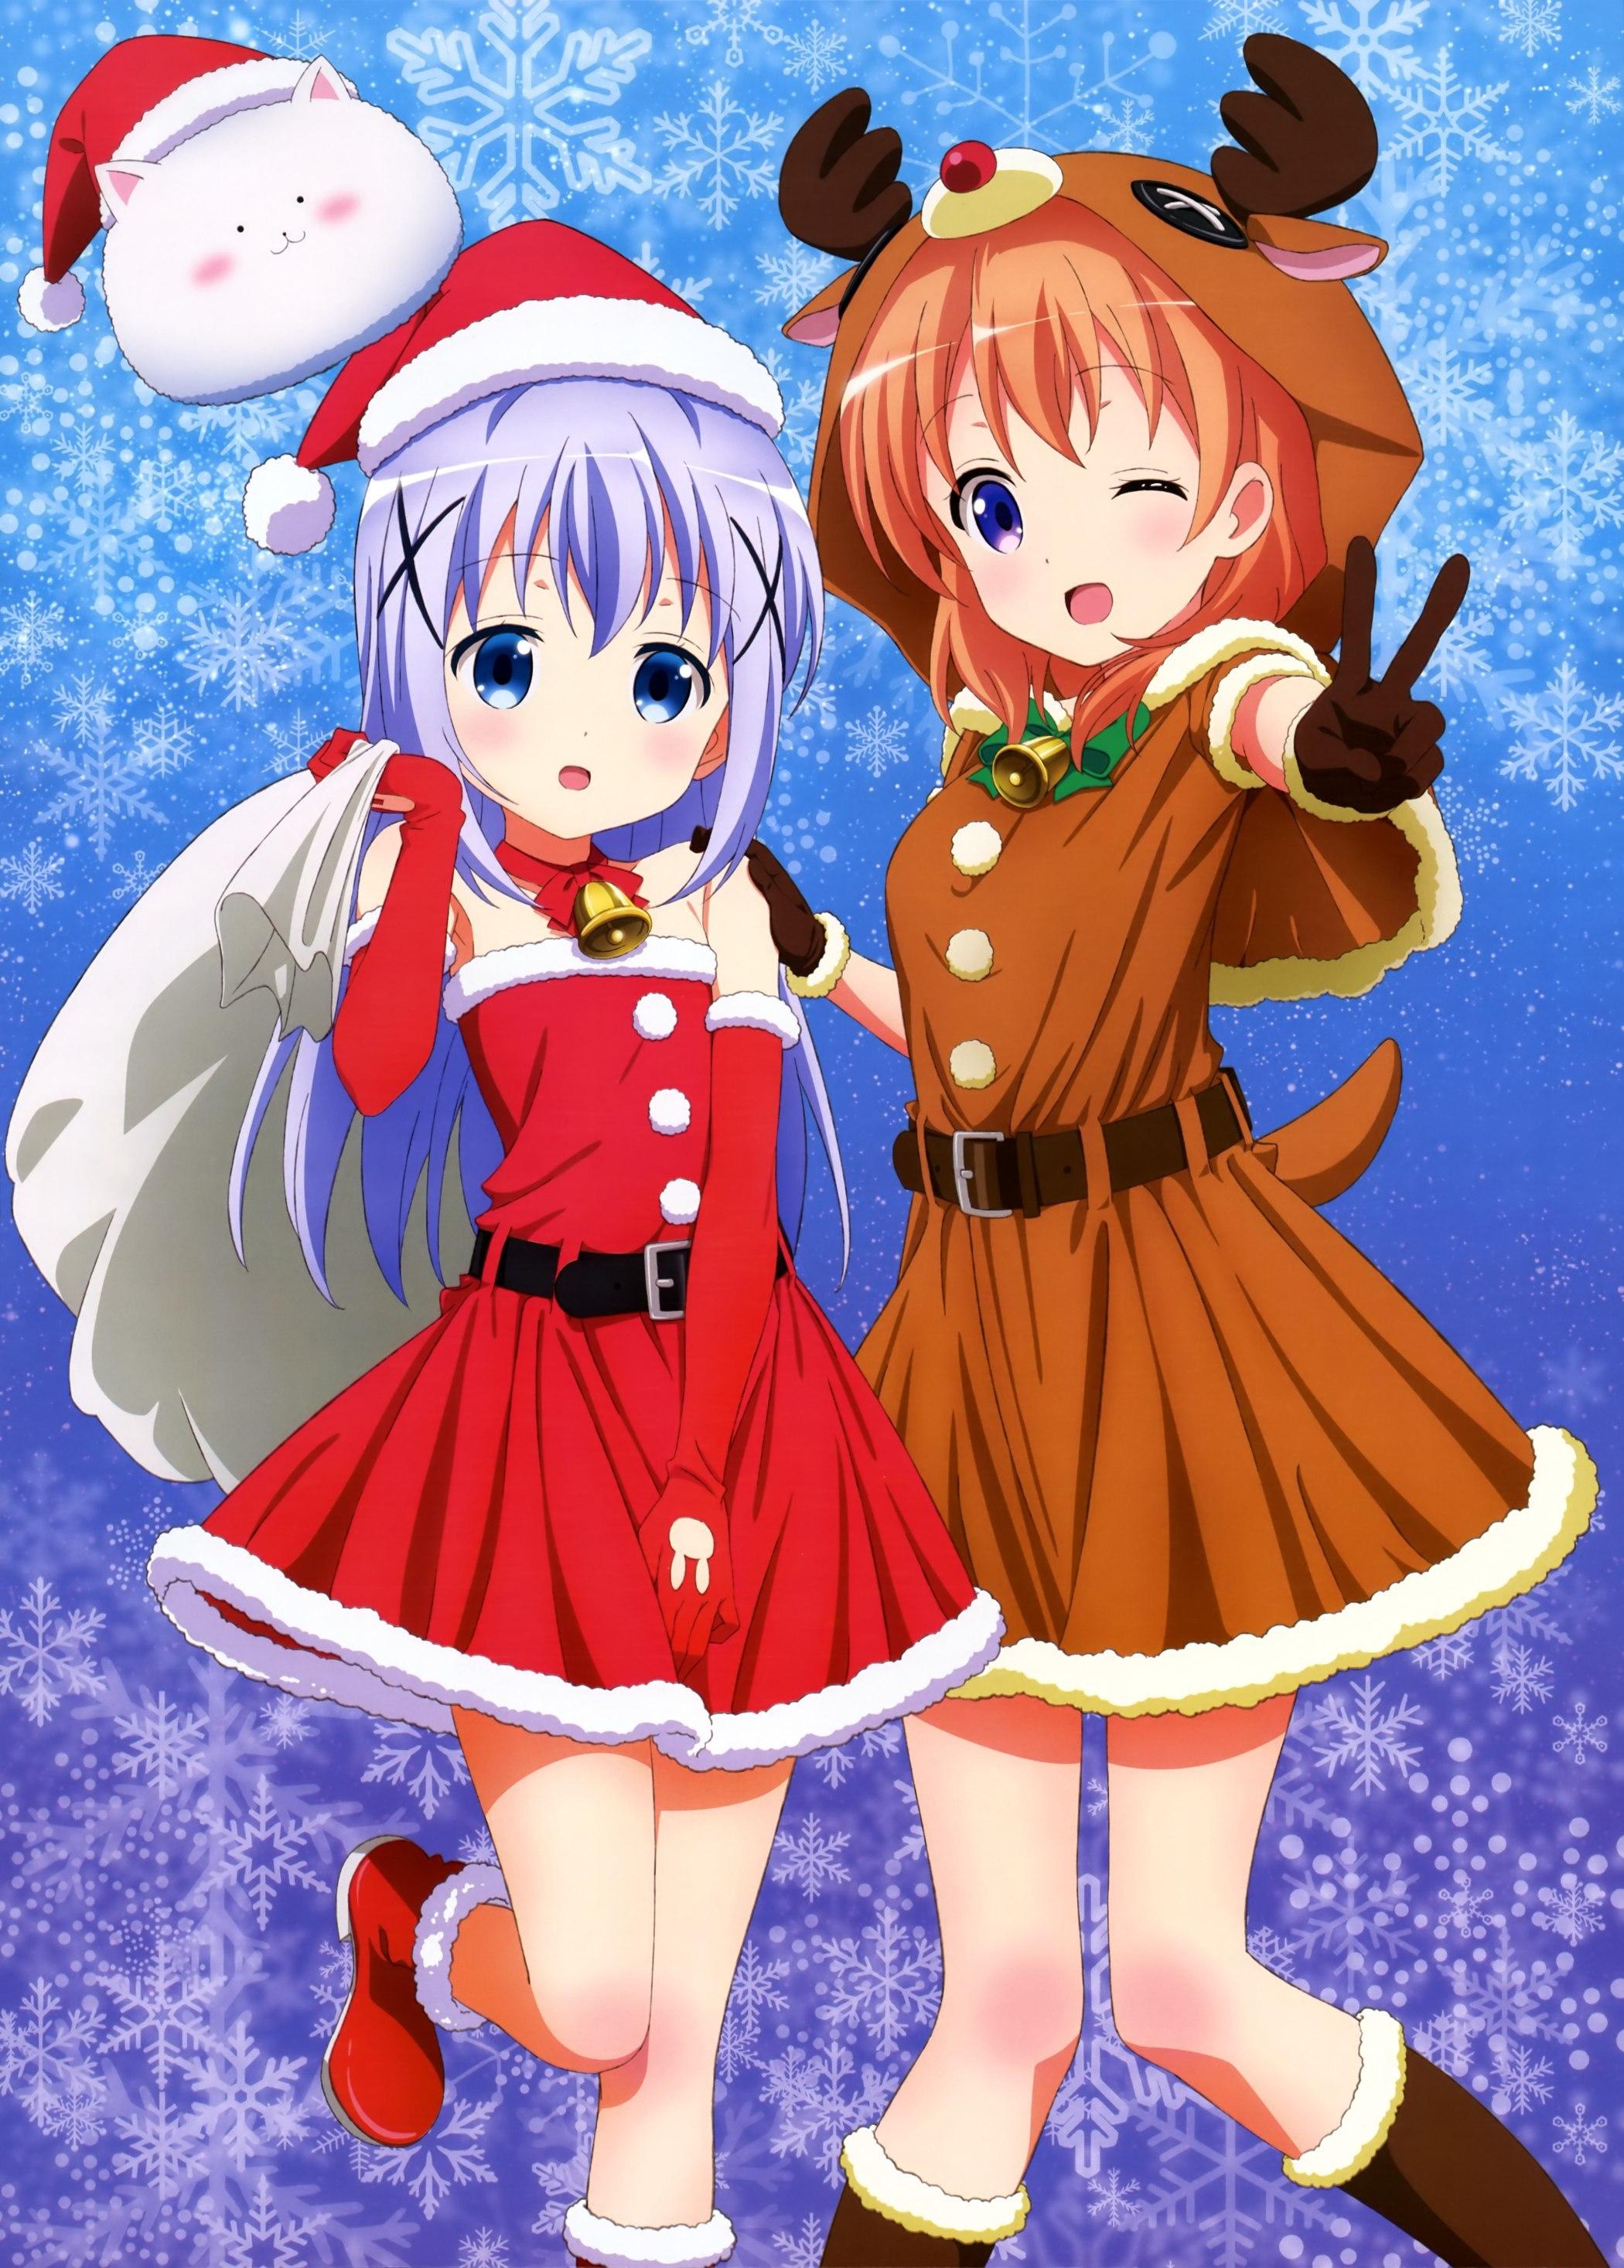 Merry Christmas minna! - Rules, News & Announcements - Anime Sri Lanka